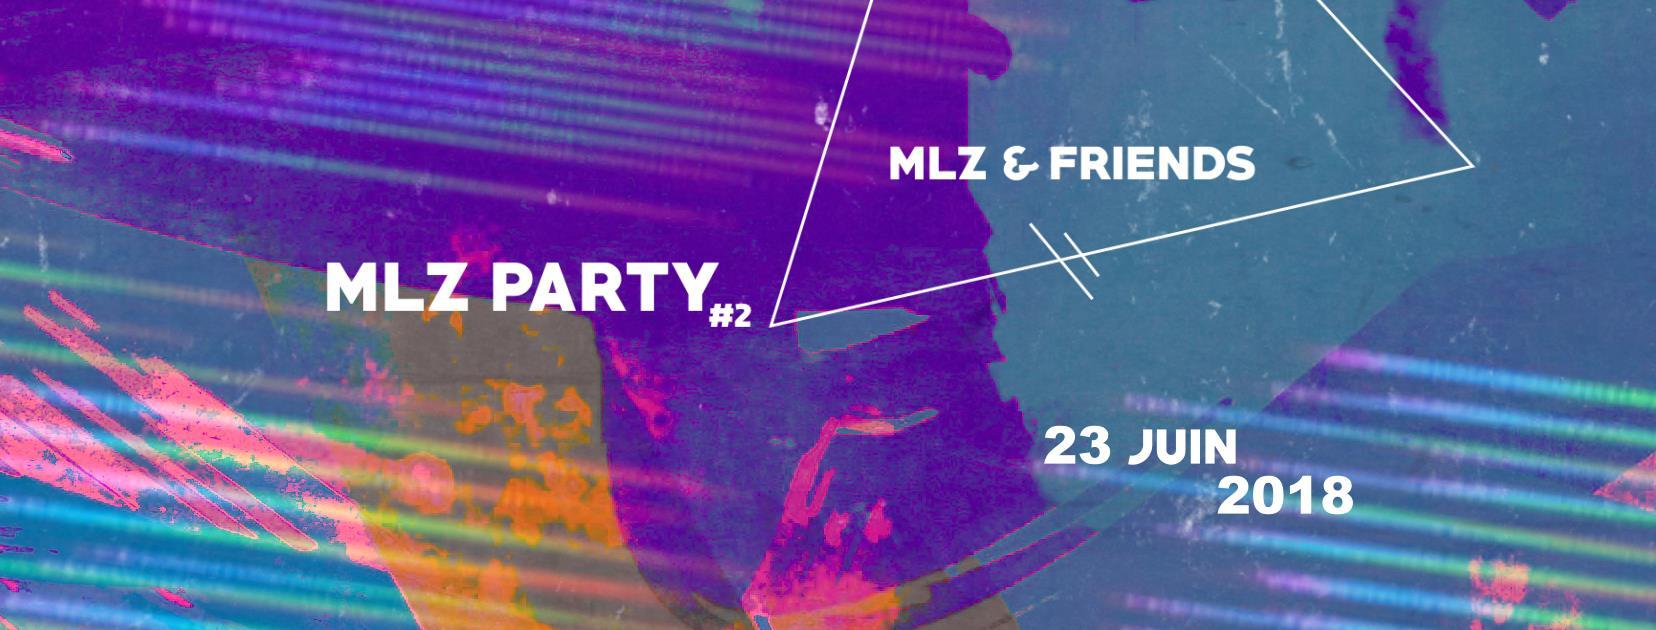 MLZ PARTY #02